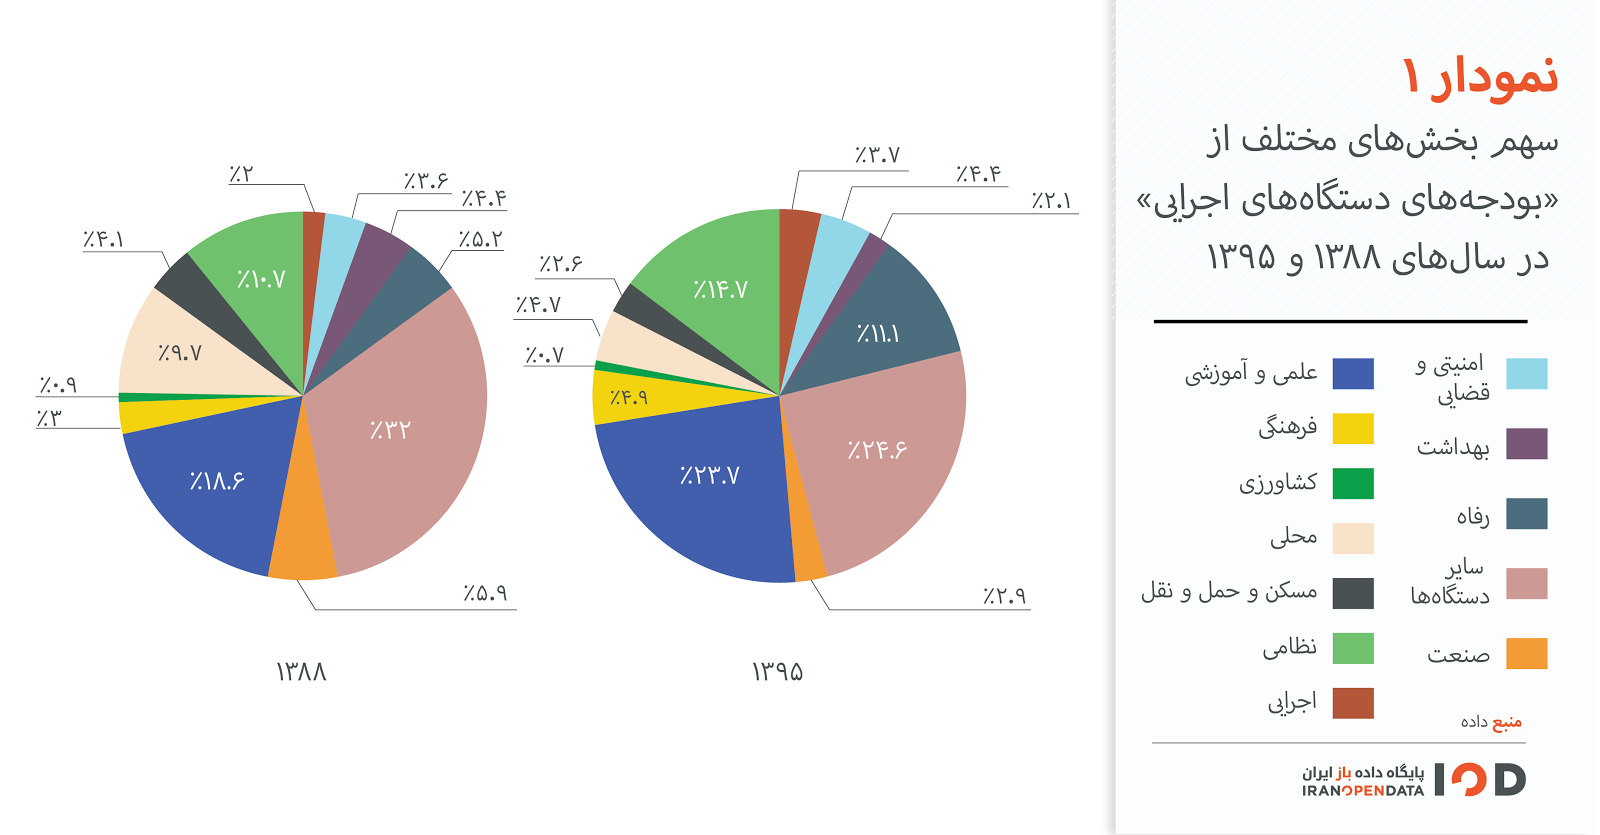 rohani-ahmadinejad-budget-comparison